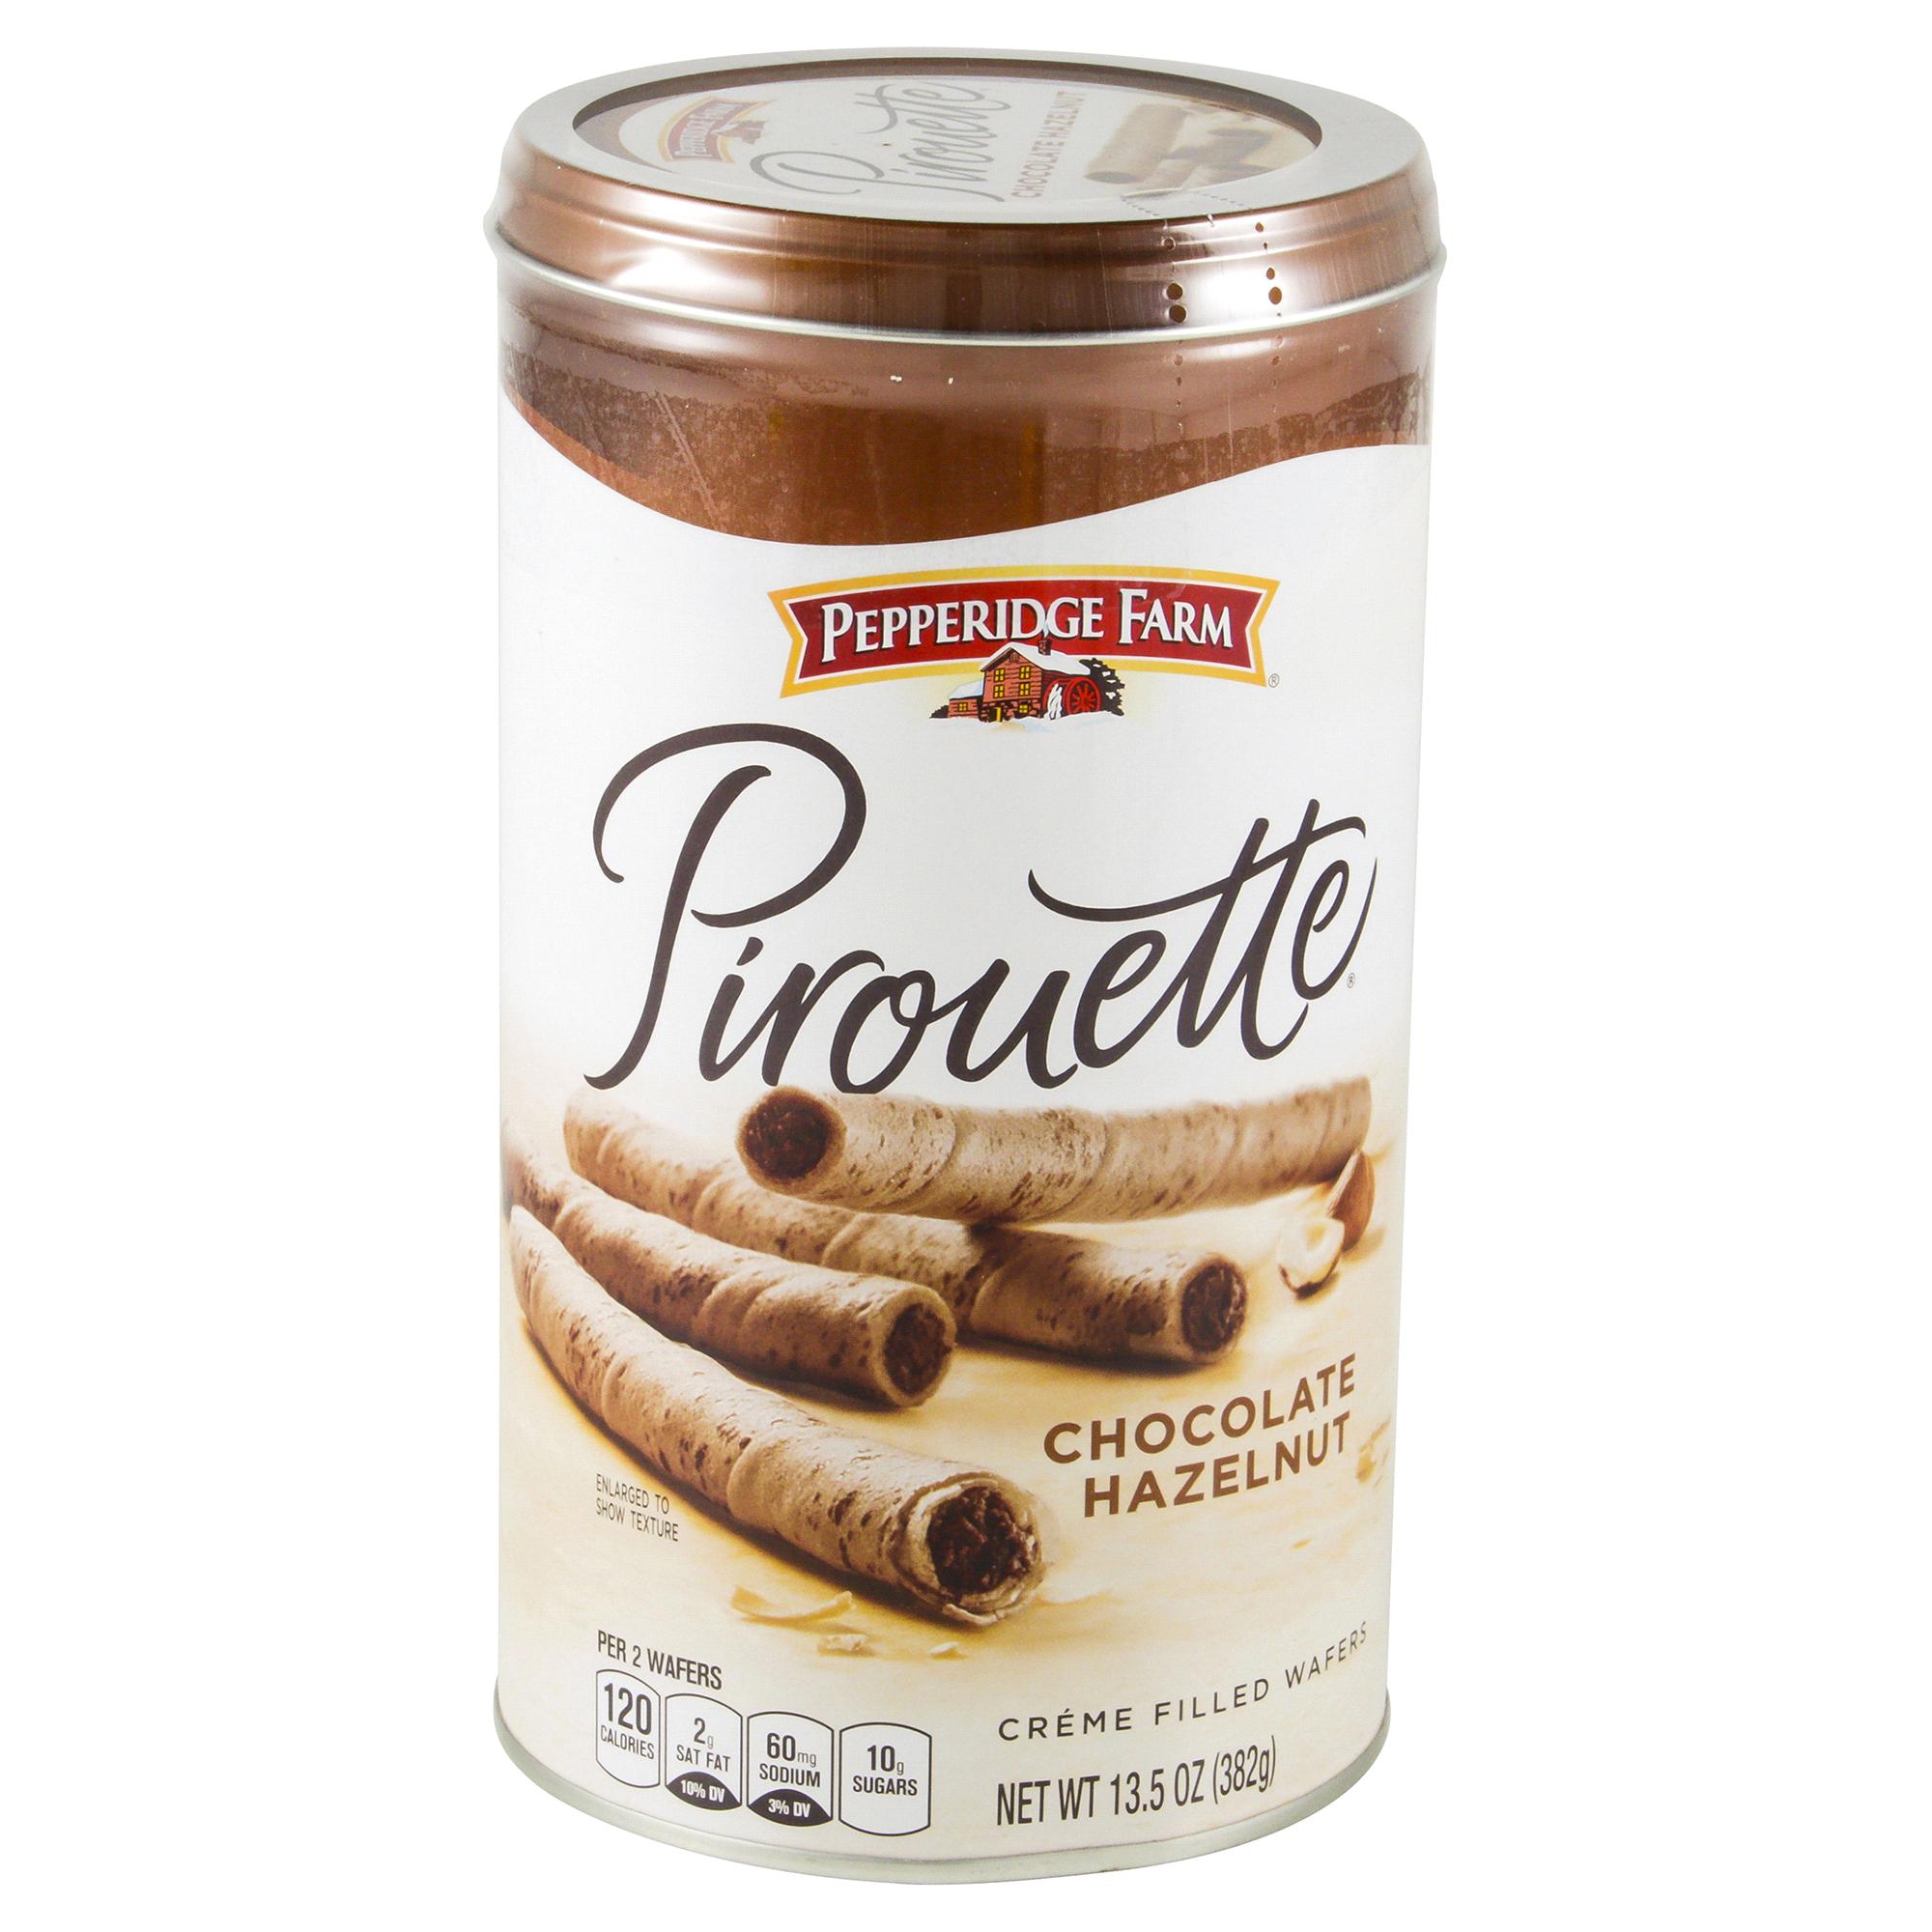 Pepperidge Farm Pirouette Rolled Wafers Chocolate Hazelnut 13.5 Oz |  Meijer.com